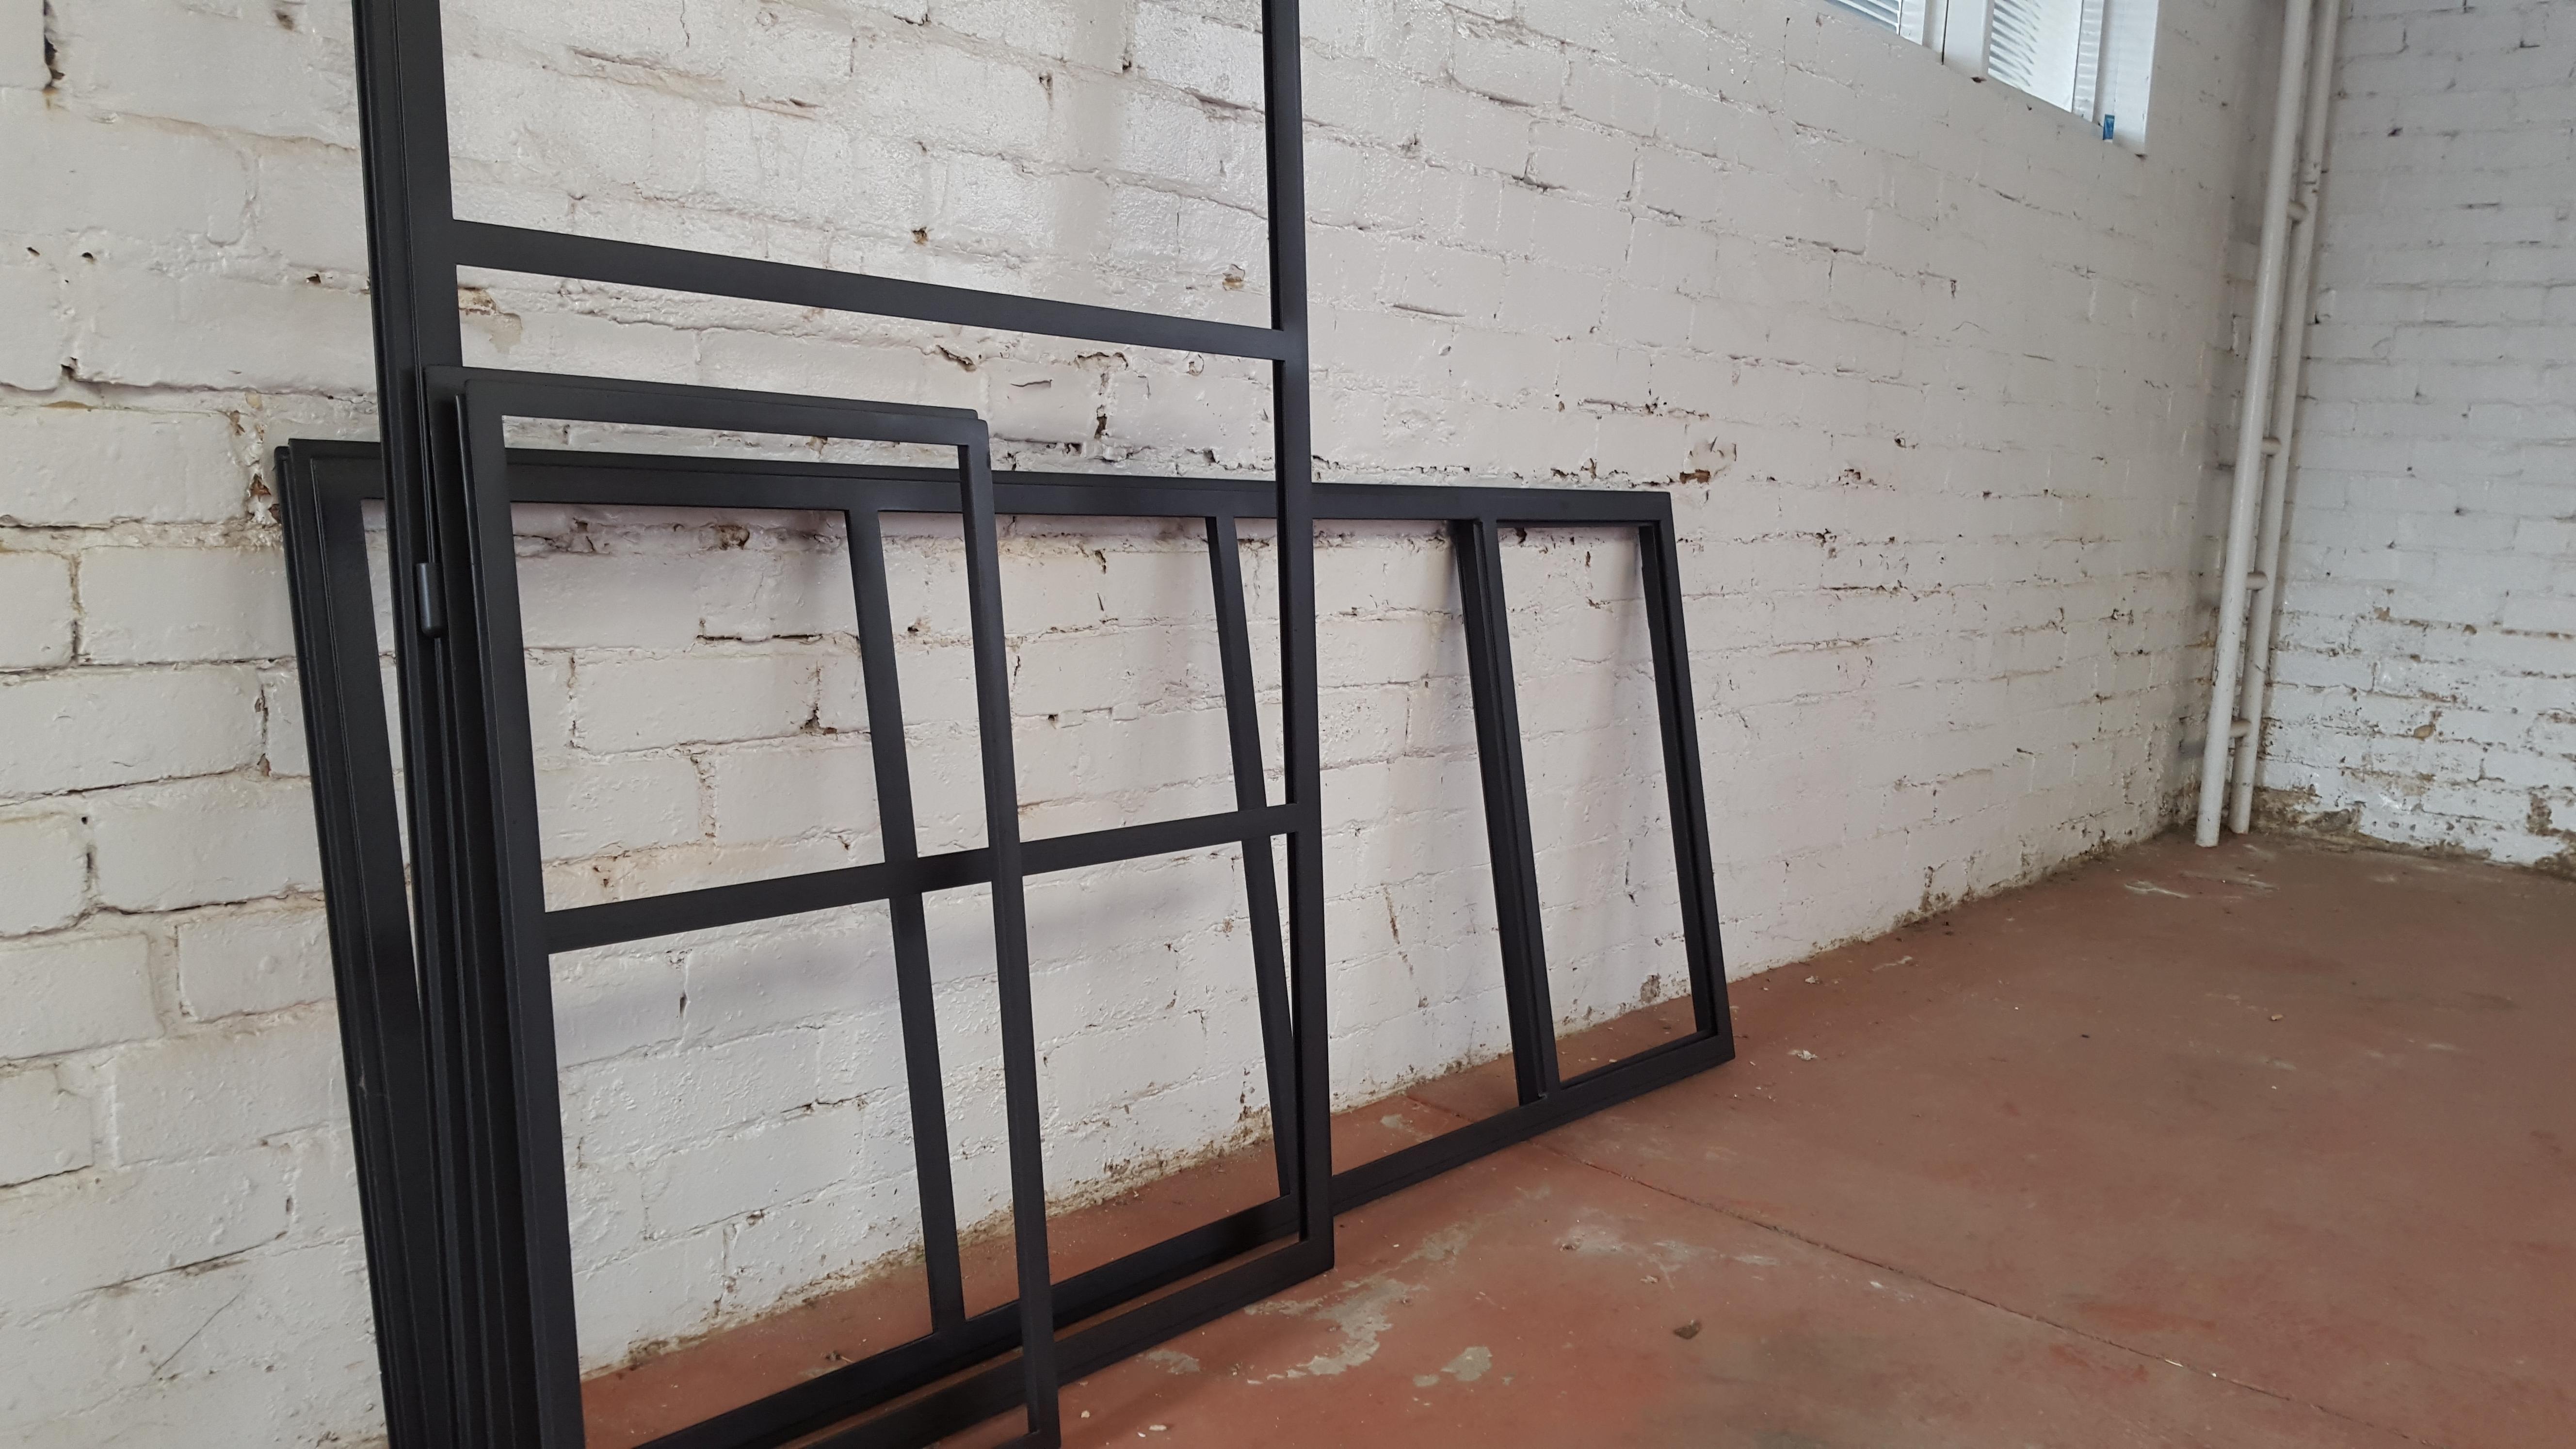 Steel frame windows and doors -  6f4d3e Brunswick Residence Steel Frame Windows Steel Frame Doors And Windows 1069 File 531229881069